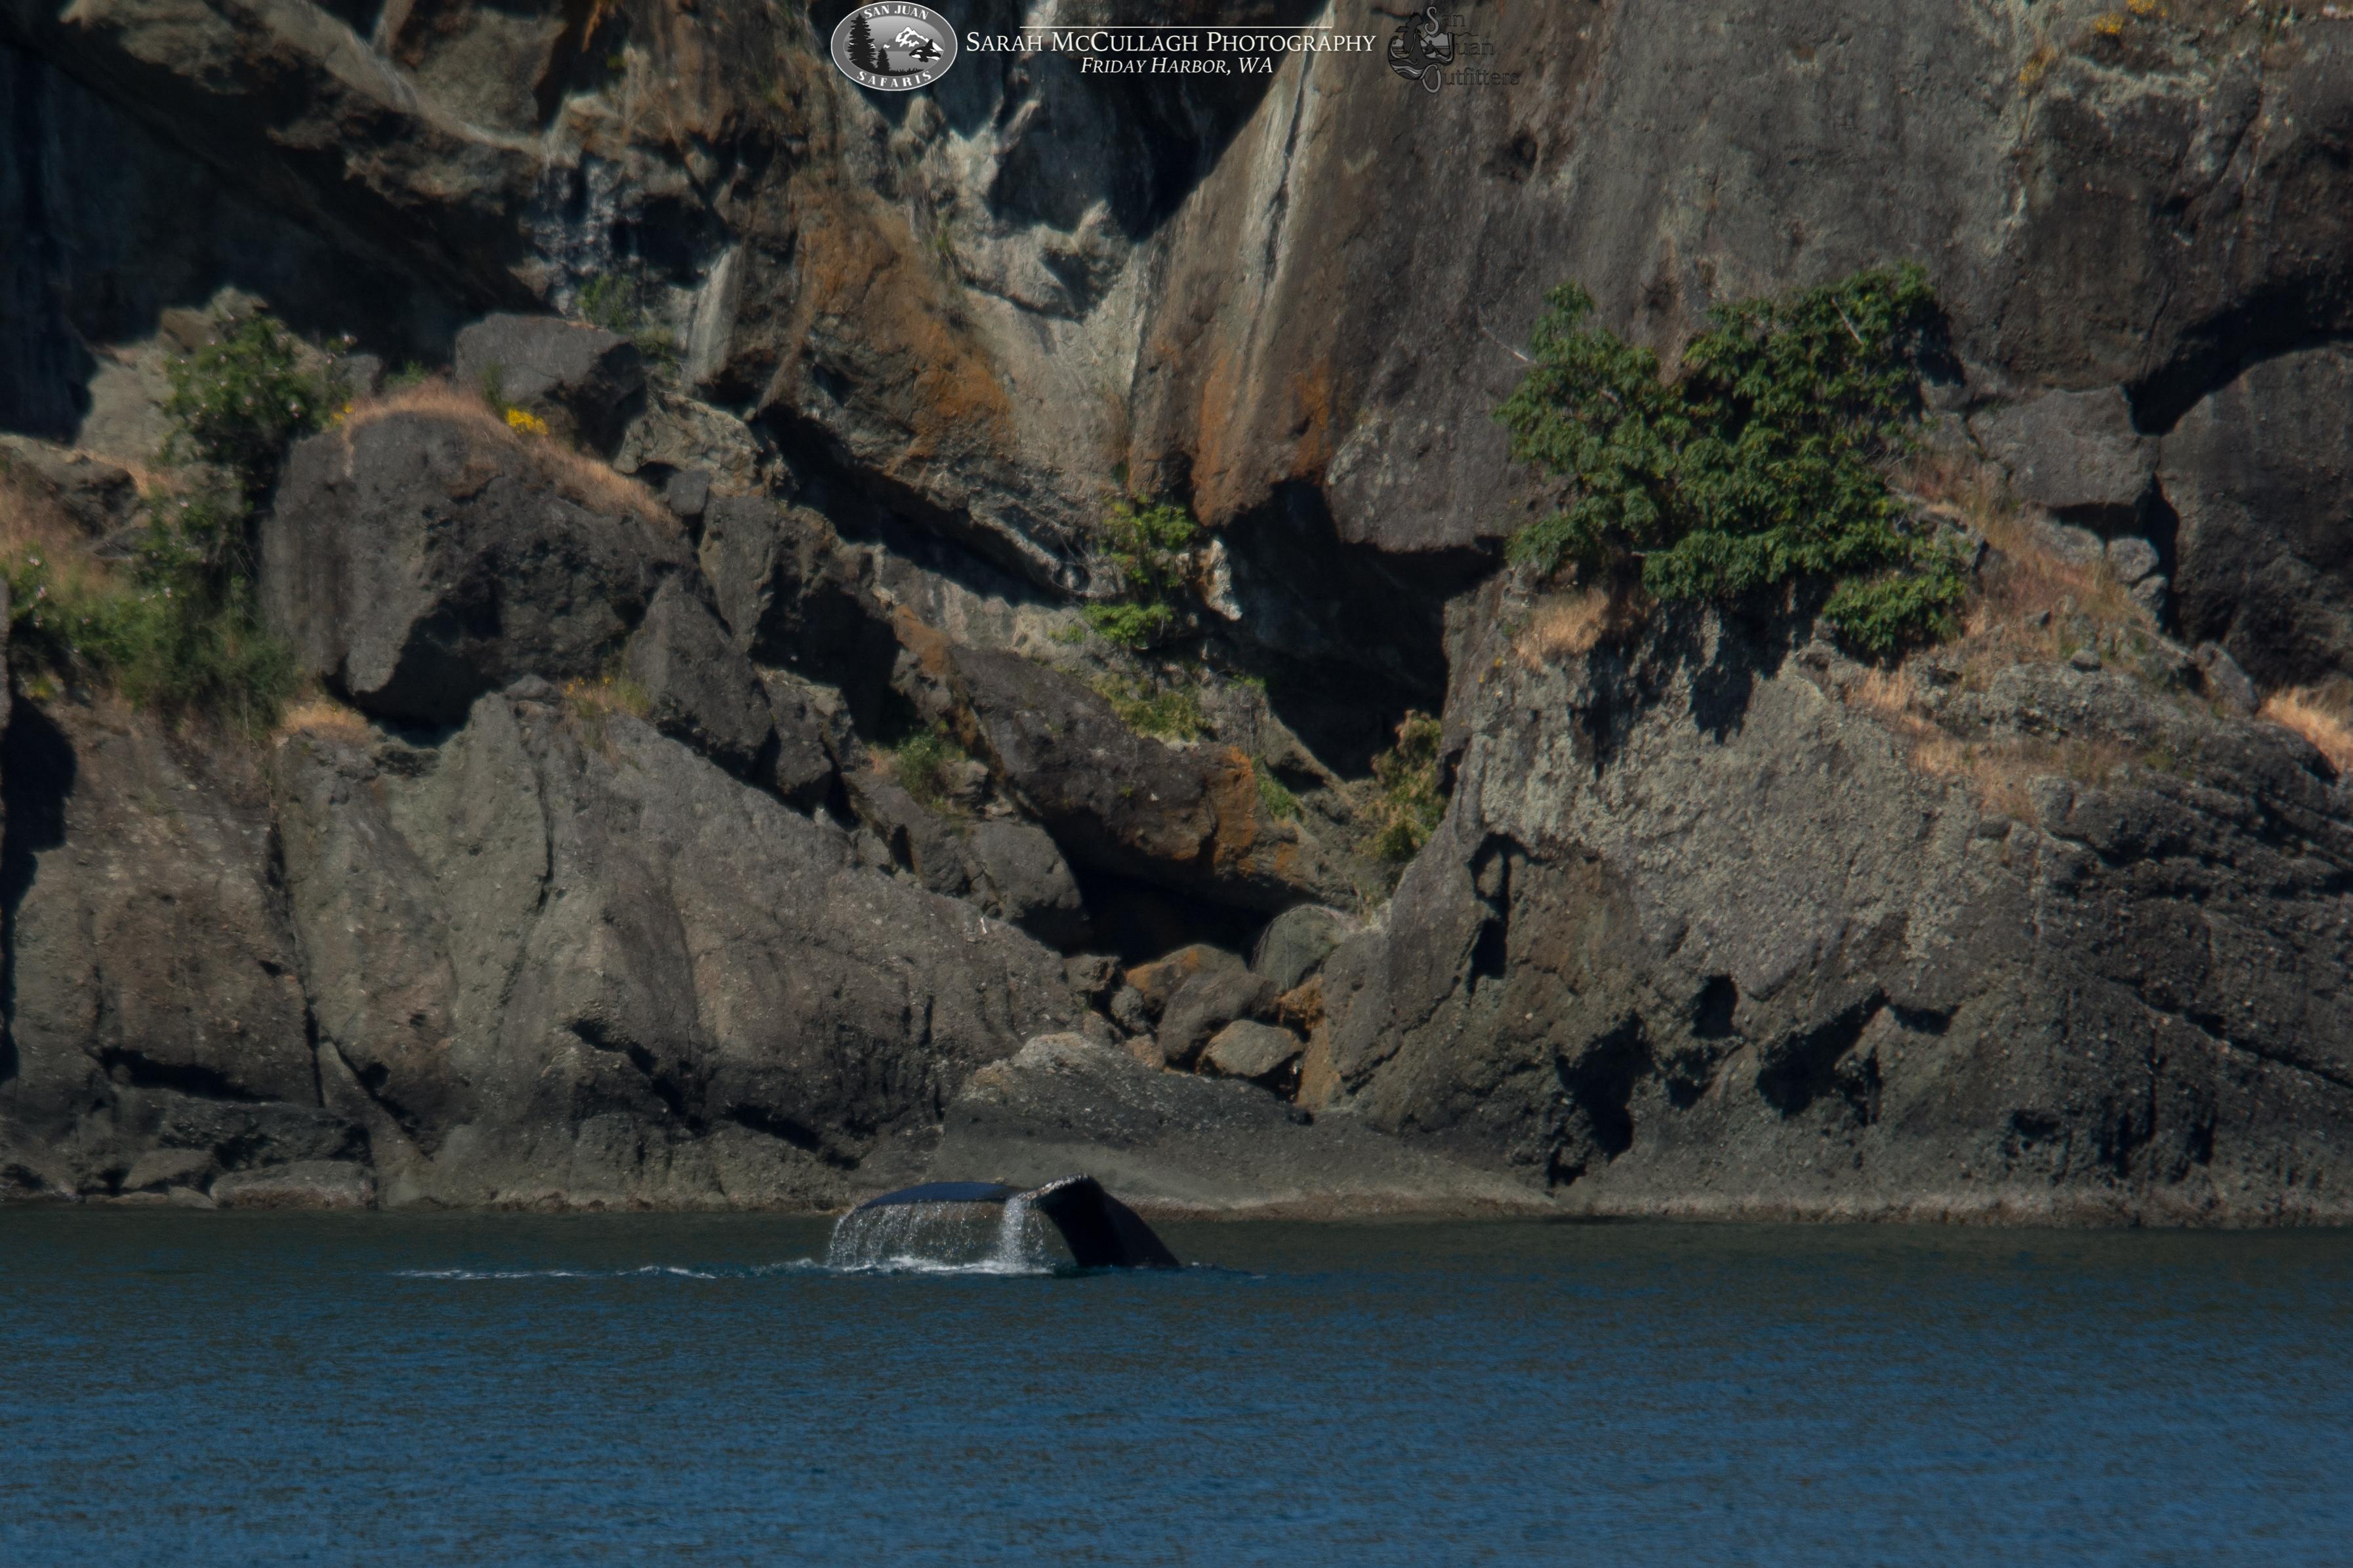 Humpbacks and Wildlife Abound in the Salish Sea